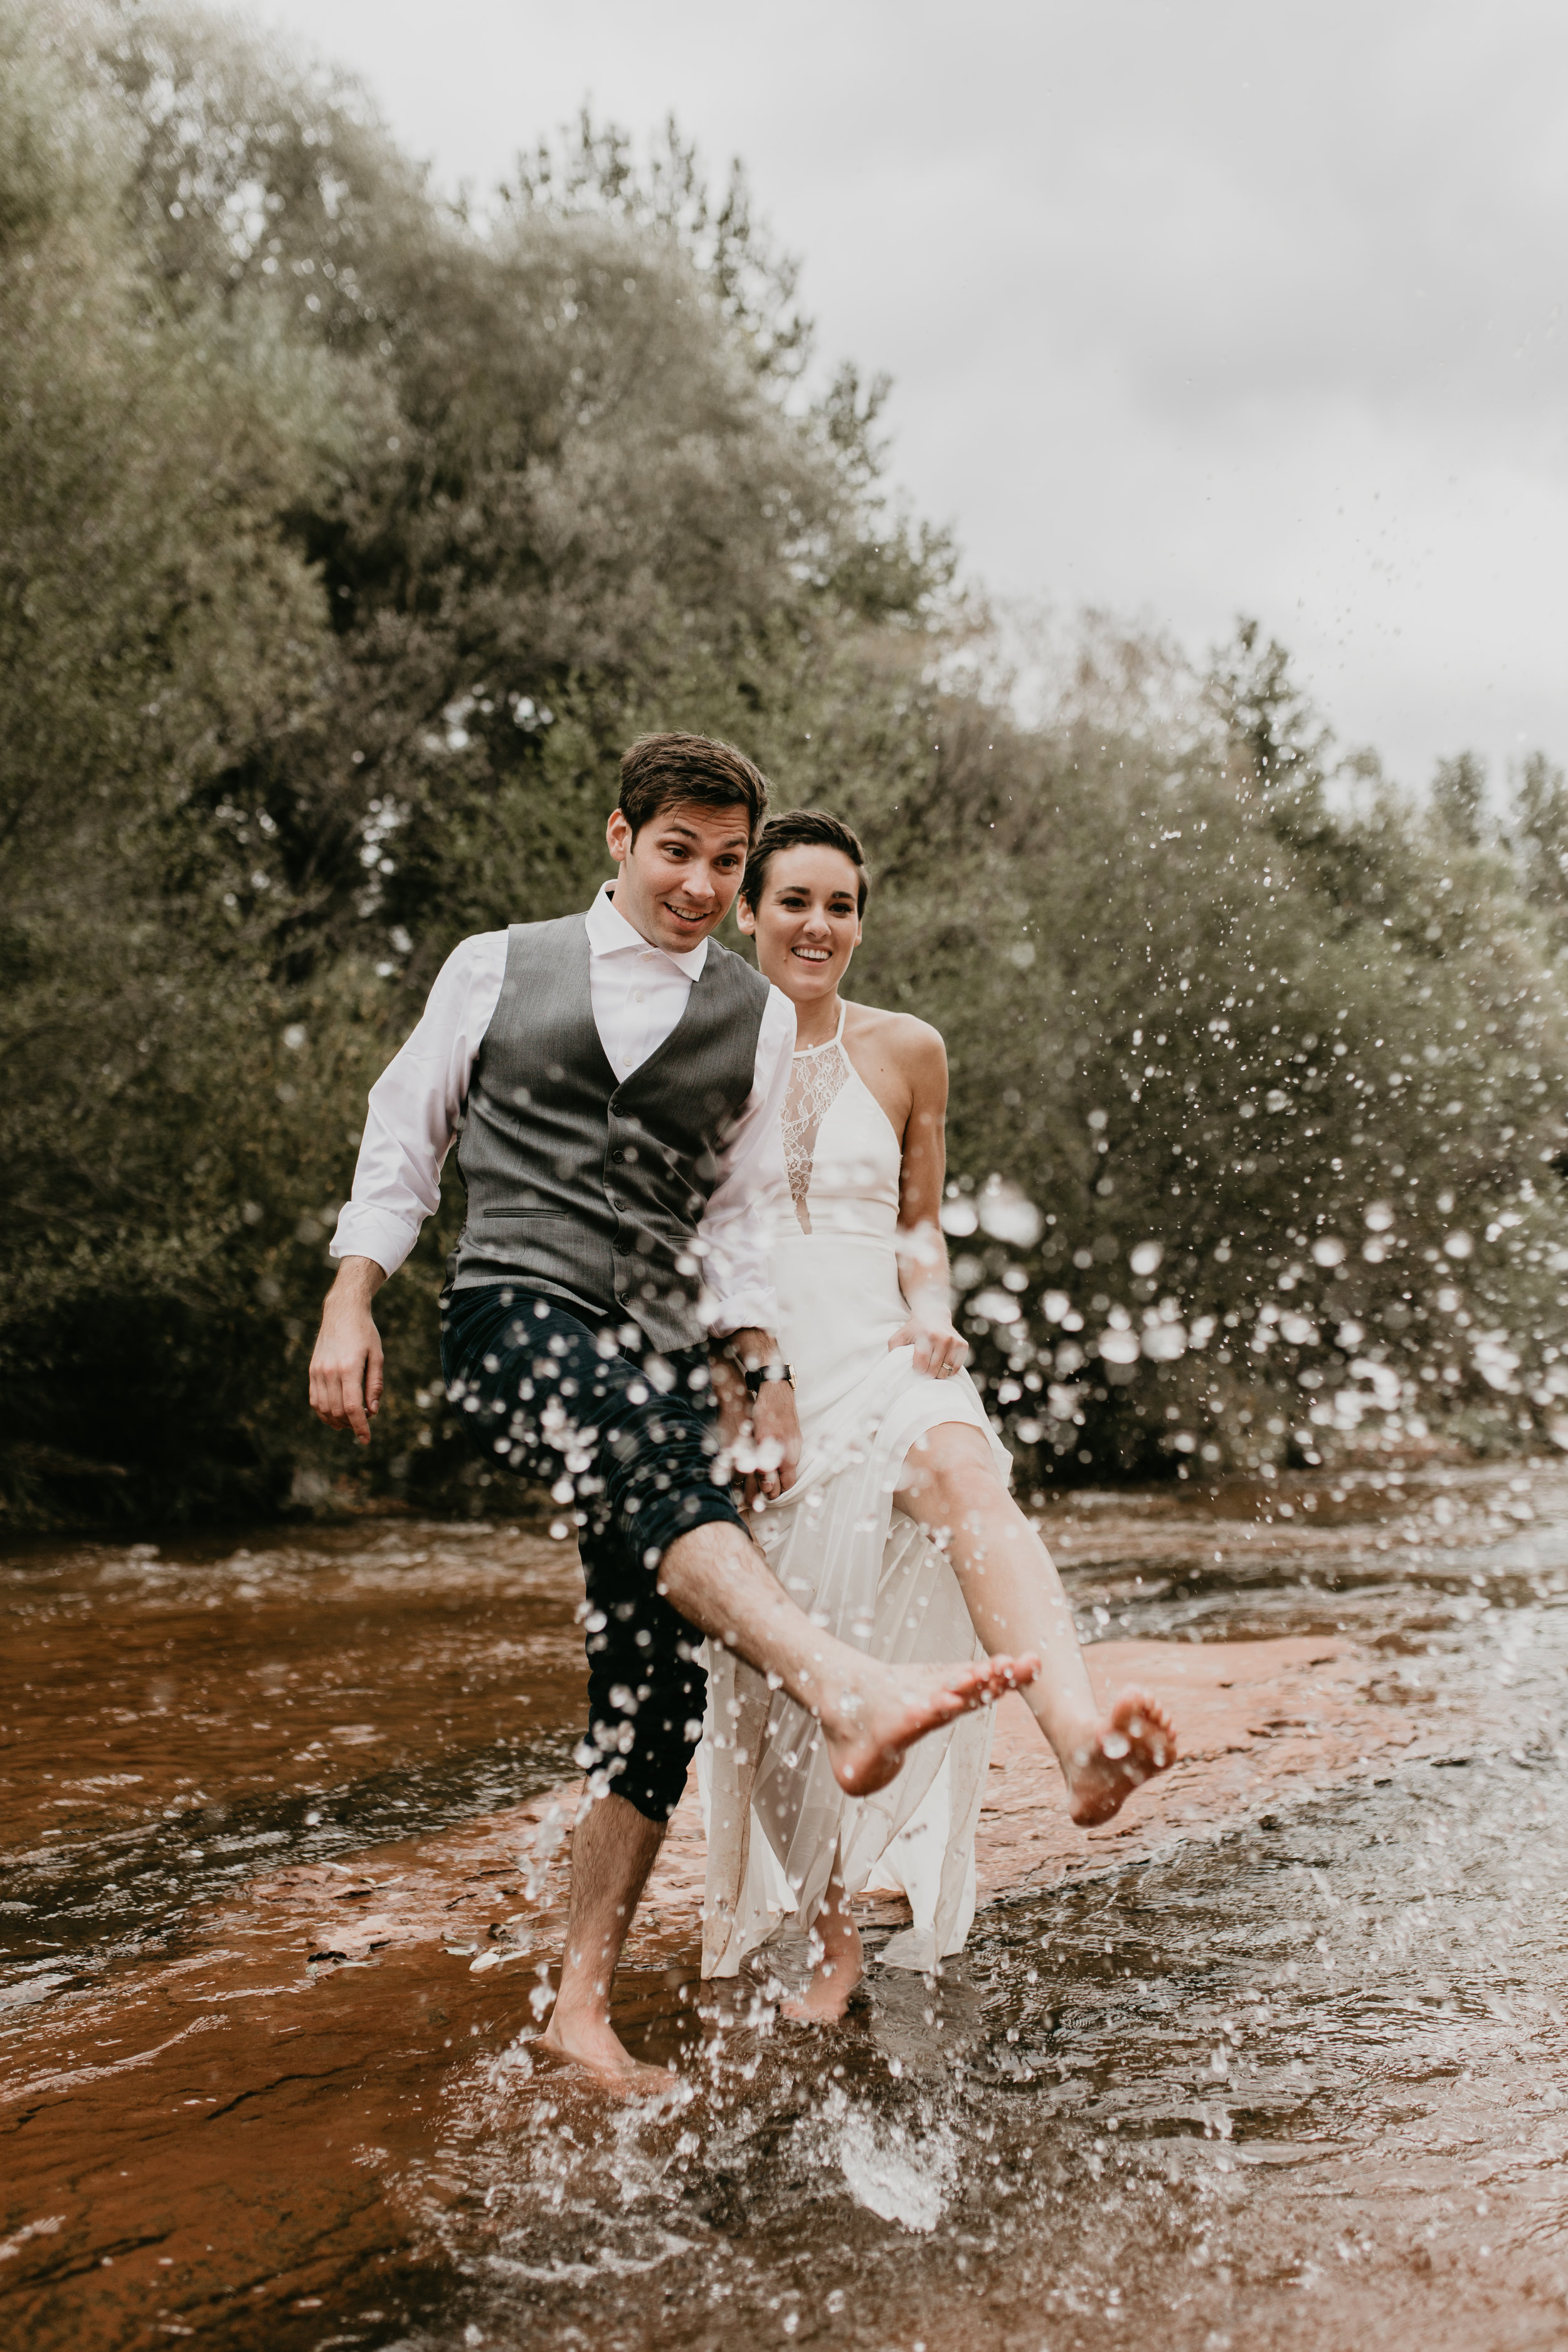 nicole-daacke-photography-sedona-arizona-destination-elopement-wedding-photographer-catherdral-rock-hiking-elopement-sedona-river-elopement-photos-desert-rock-wedding-photographer-laid-back-spontaneous-elopement-117.jpg